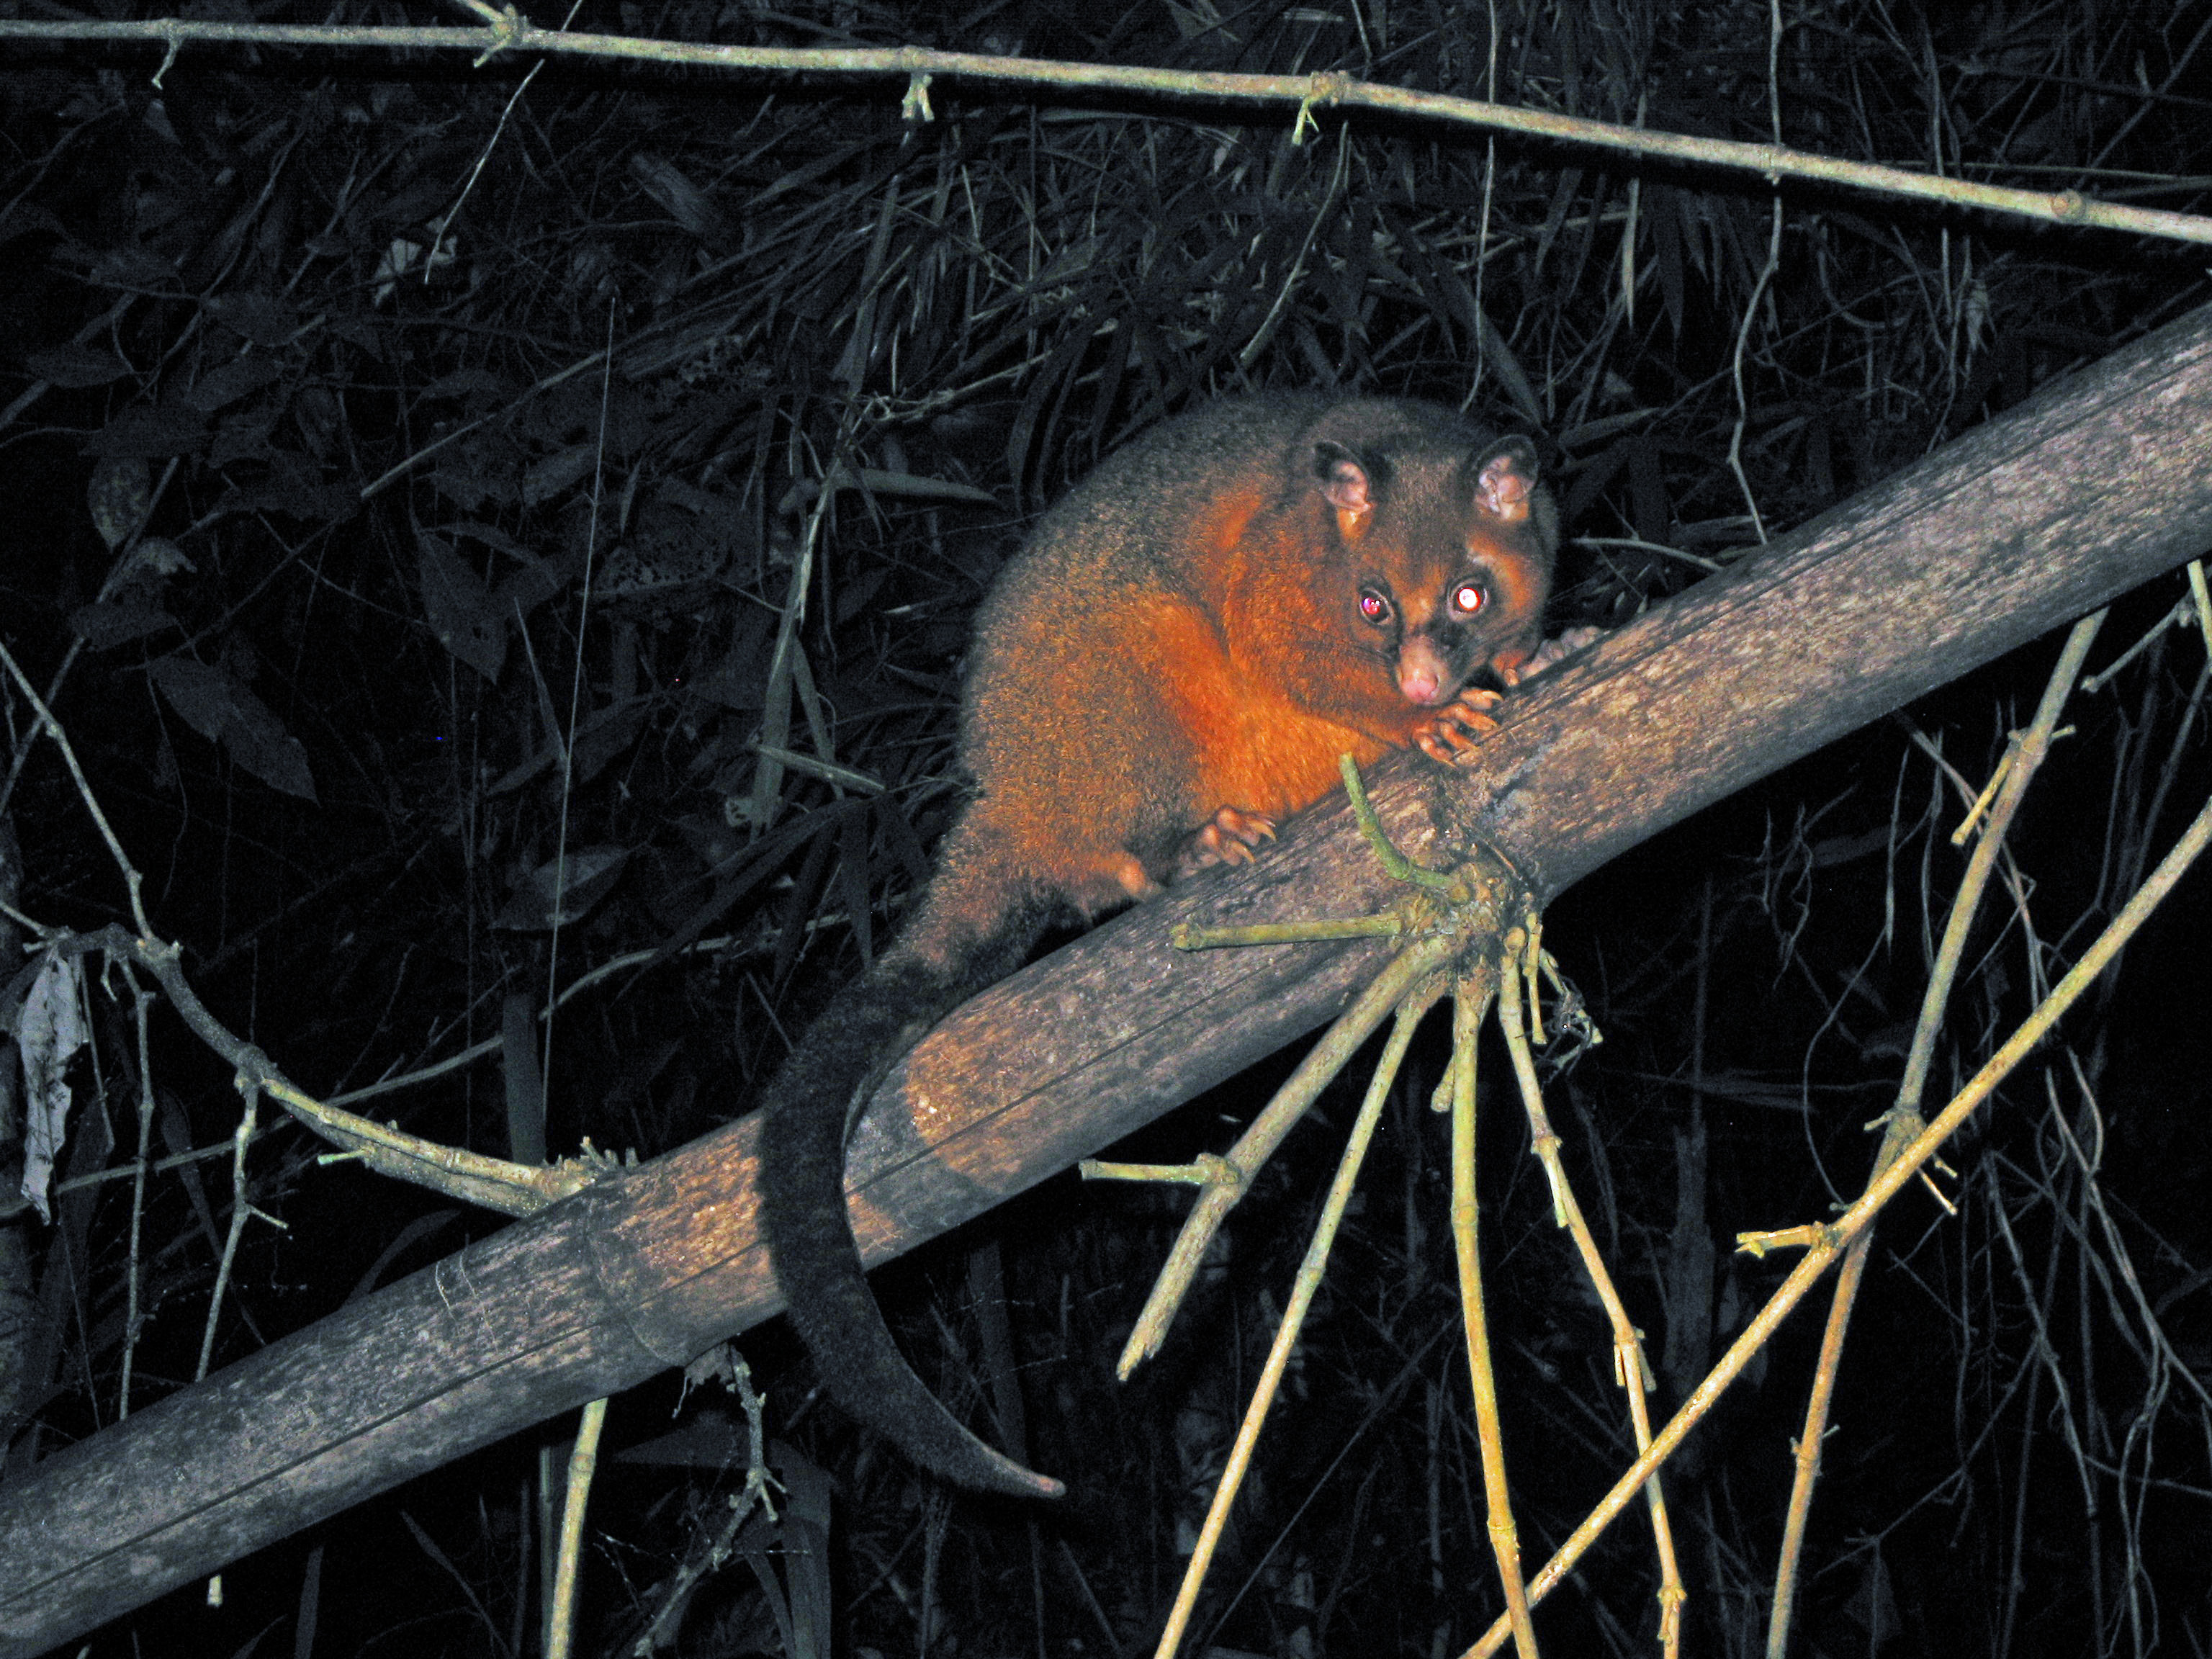 https://upload.wikimedia.org/wikipedia/commons/5/5d/Coppery_Brushtail_Possum_%283625102158%29.jpg